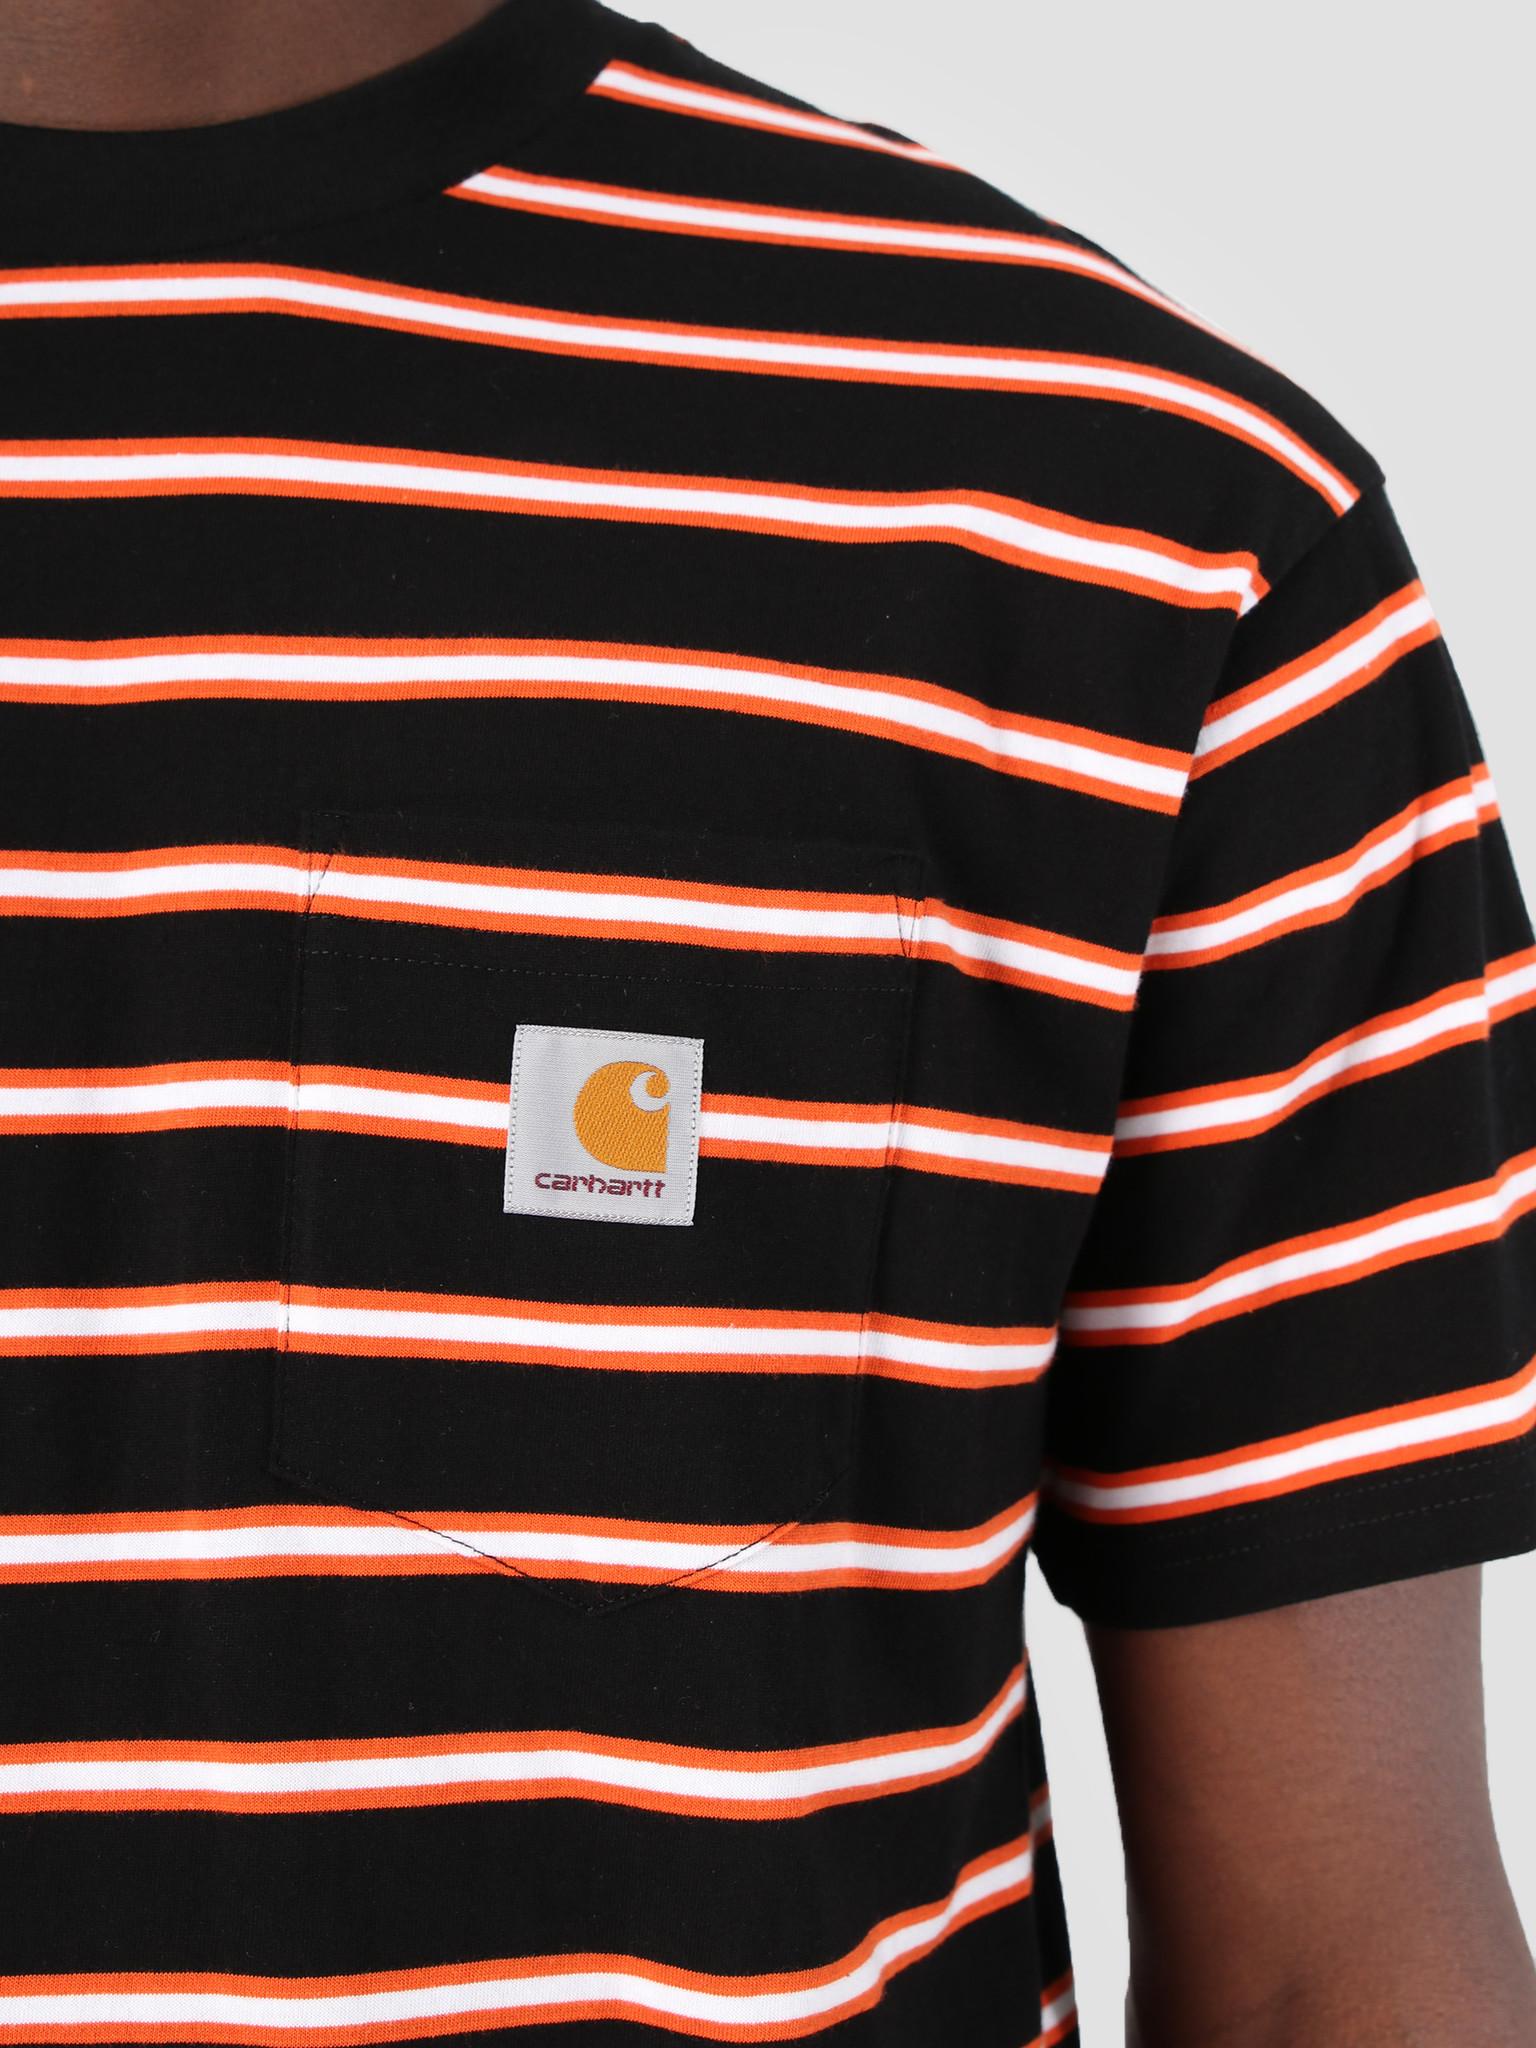 Carhartt WIP Carhartt WIP Houston Pocket T-Shirt Stripe Houston Stripe, Black I026370